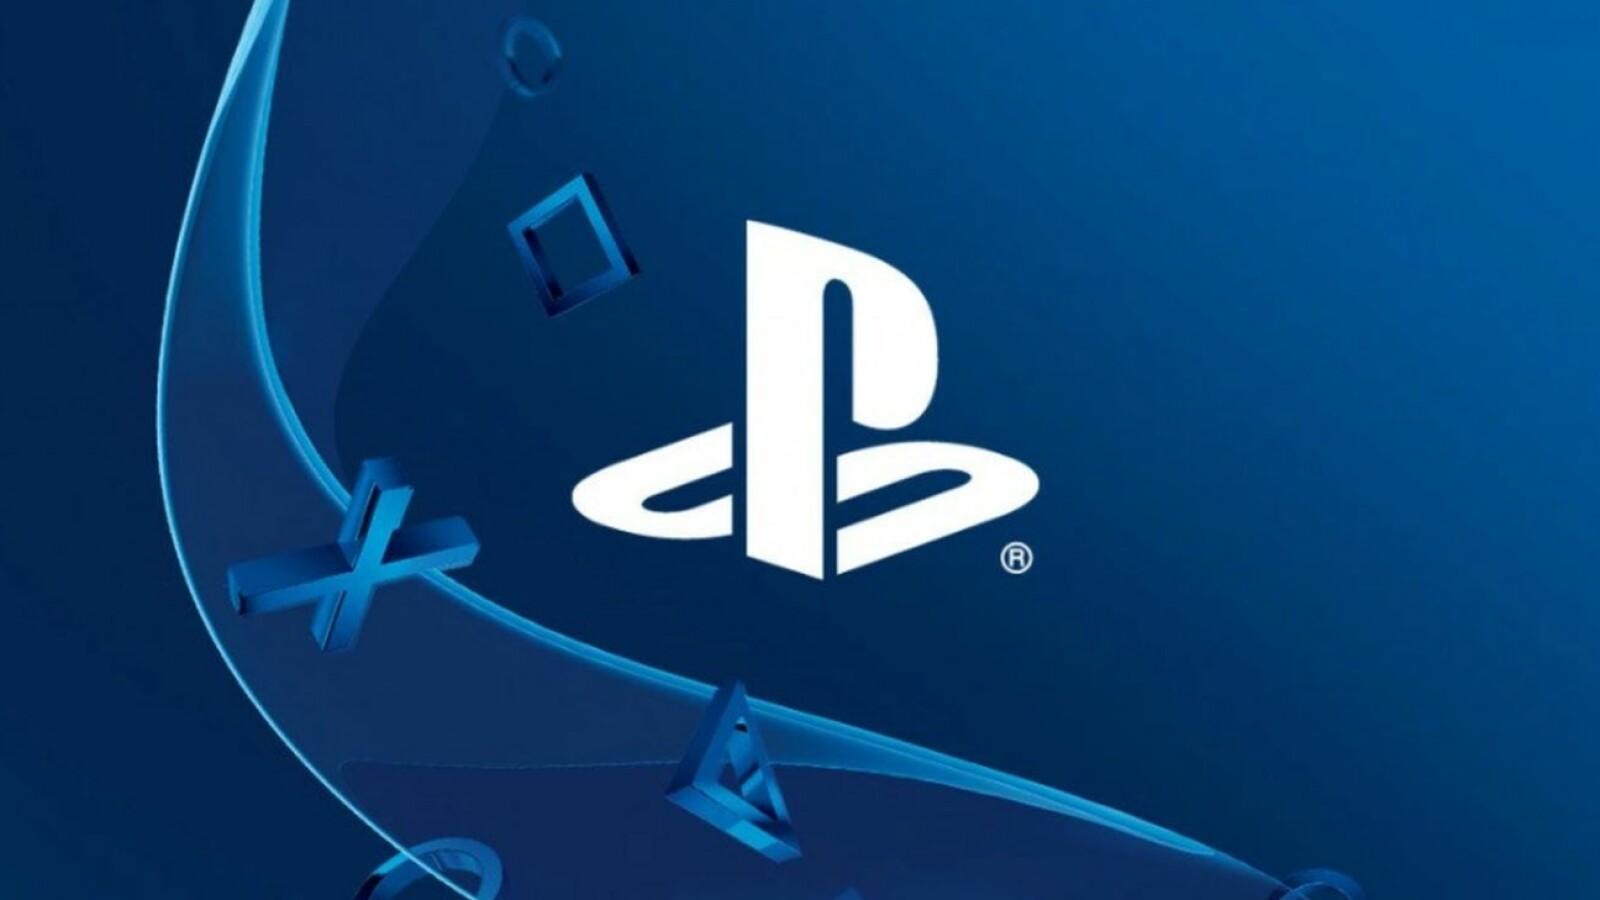 Sony zur PS6: PlayStation-Boss Jim Ryan steigert bereits Vorfreude